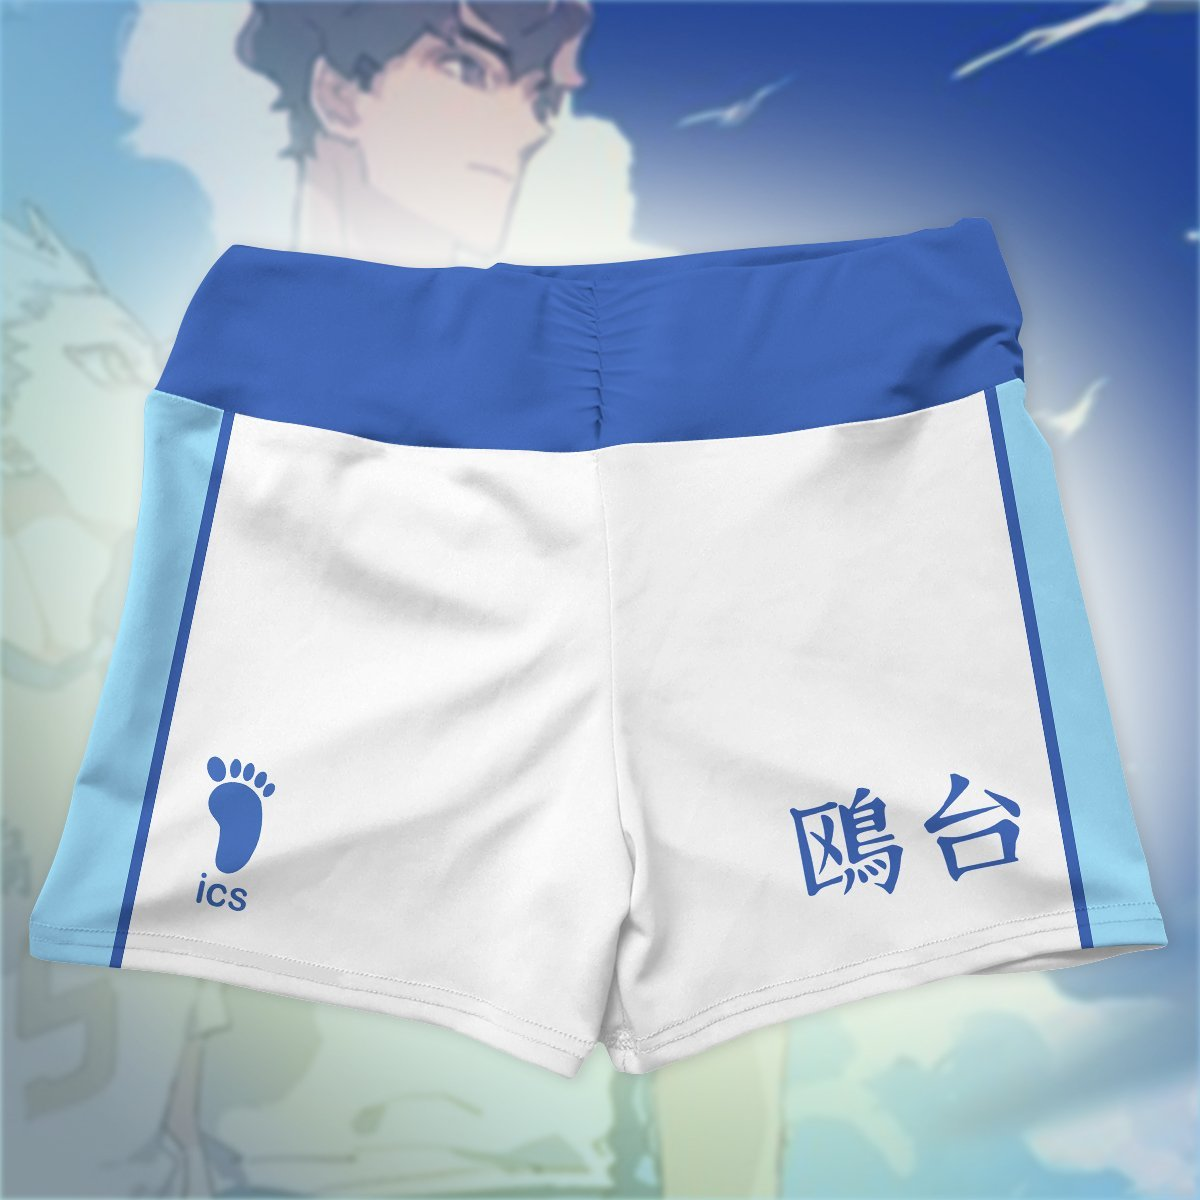 team kamomedai active wear set 157979 - Anime Swimsuits